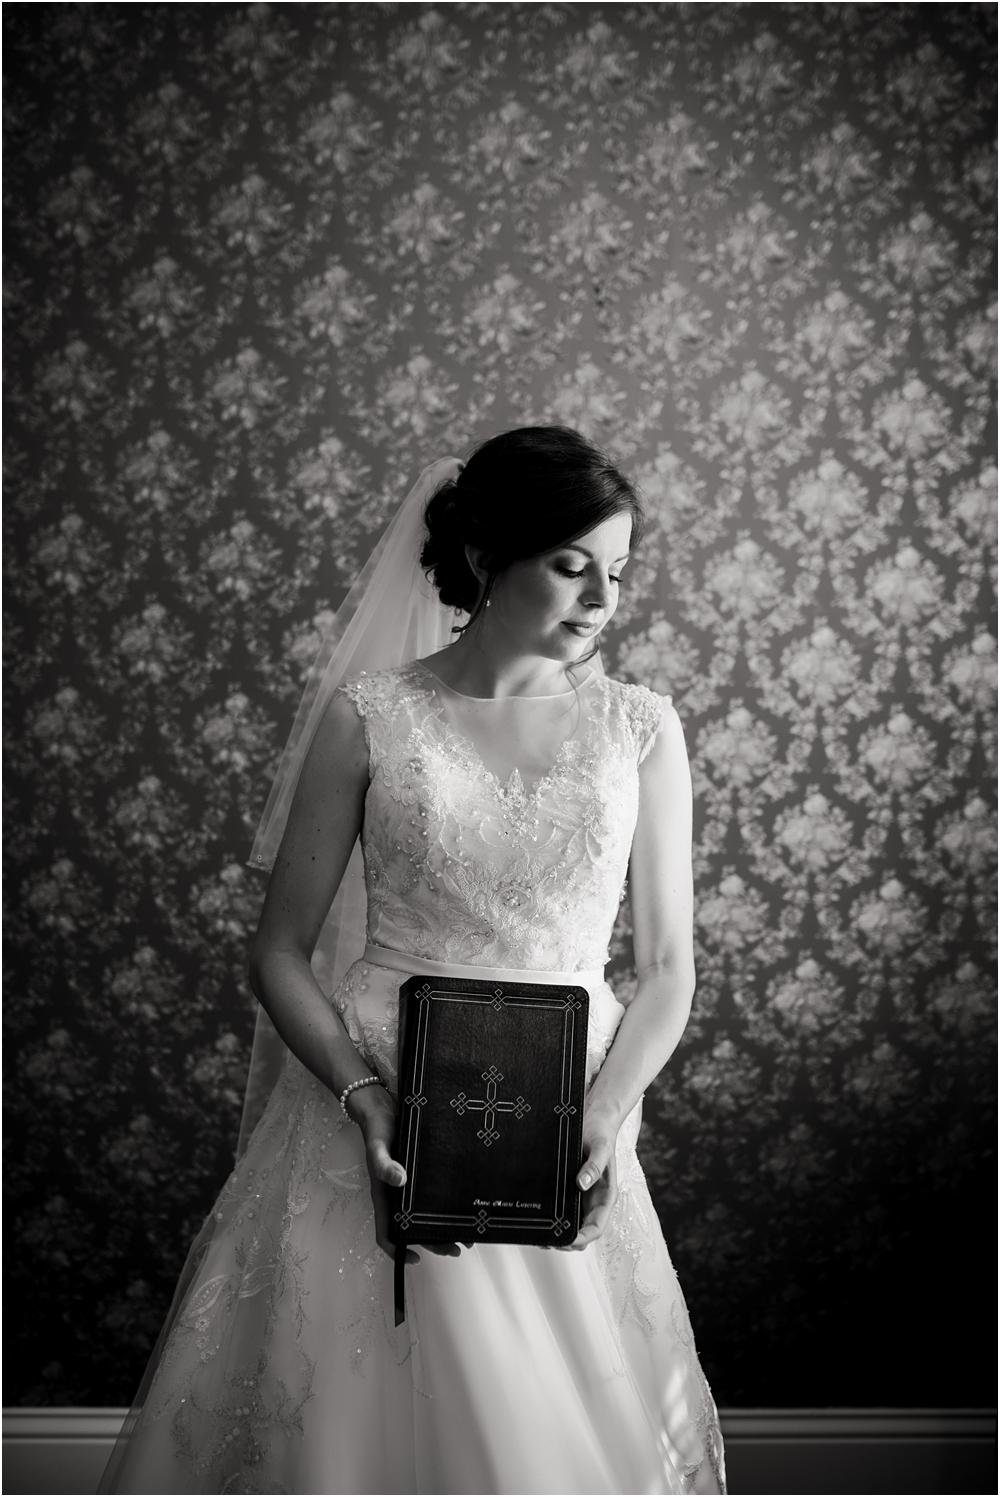 marianna-florida-wedding-photographer-kiersten-grant-31.jpg